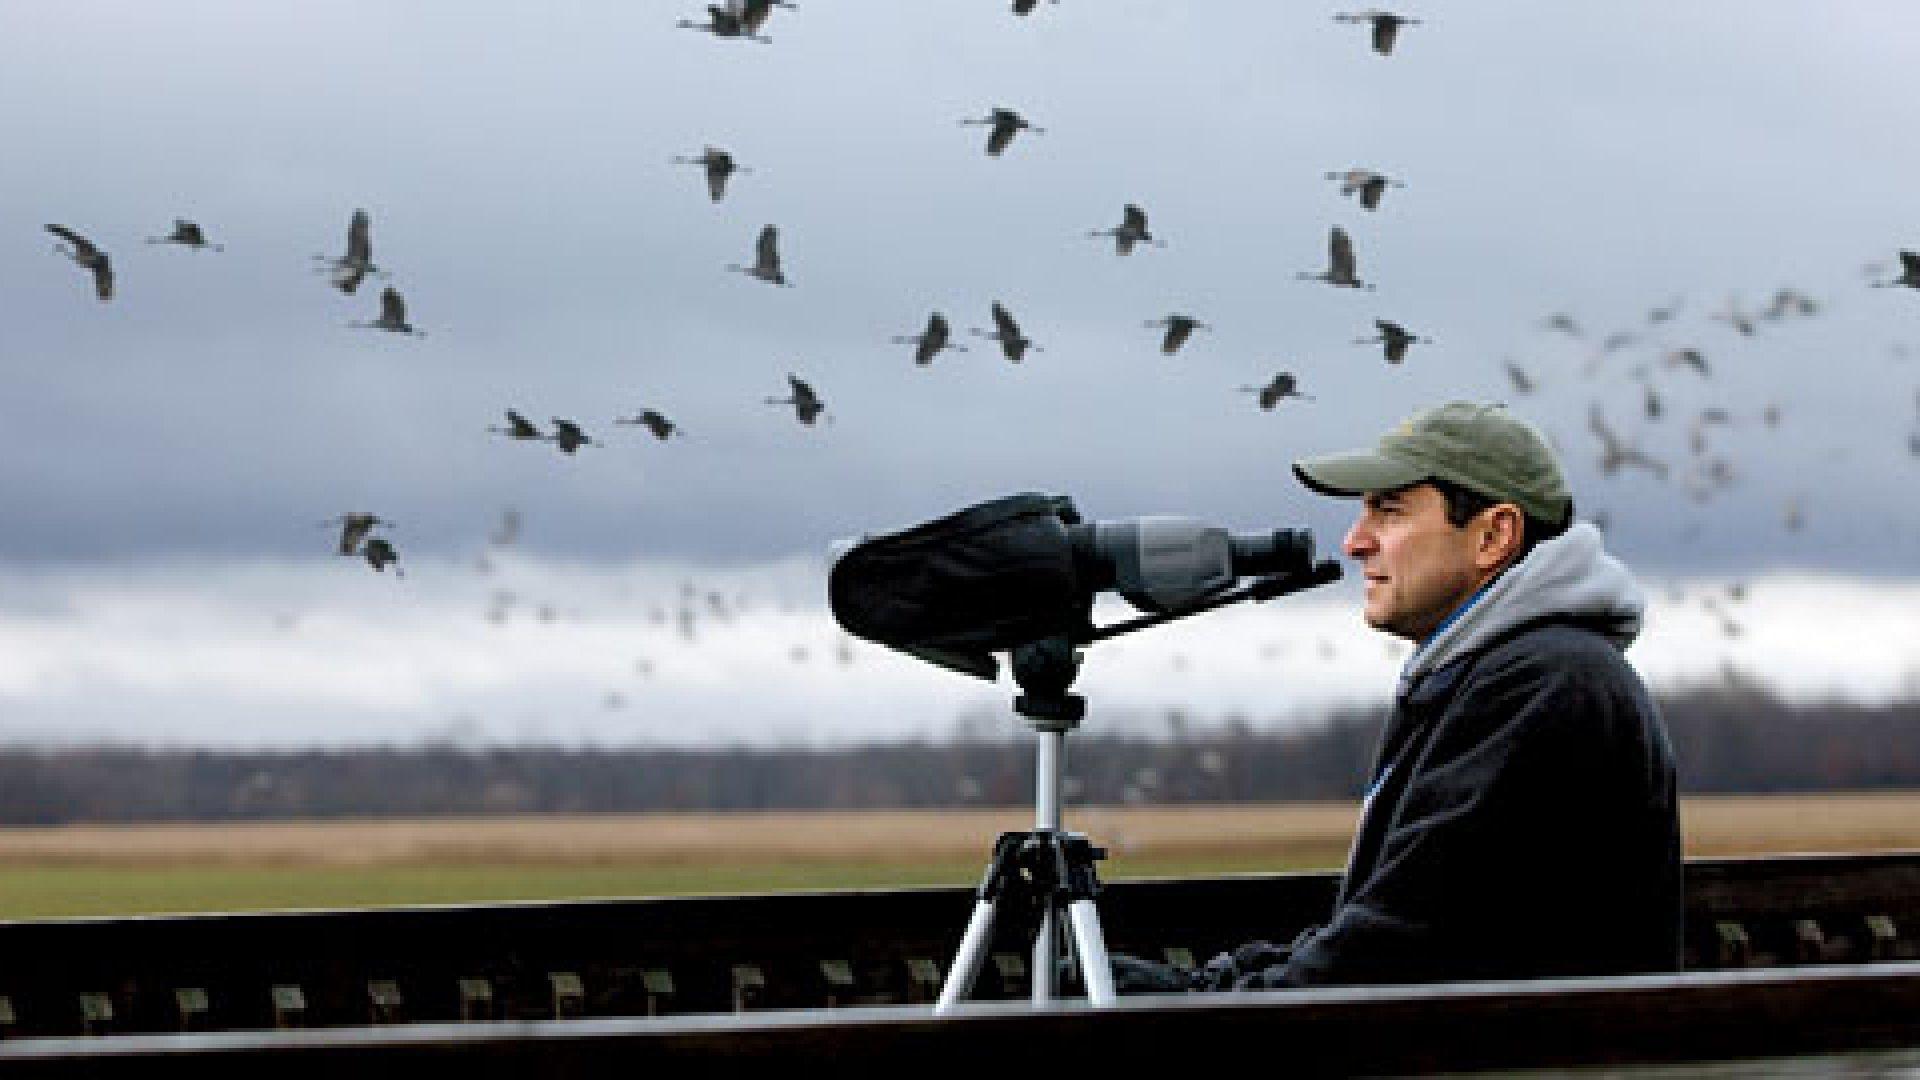 Passions: Vernon LaVia, Bird Watcher